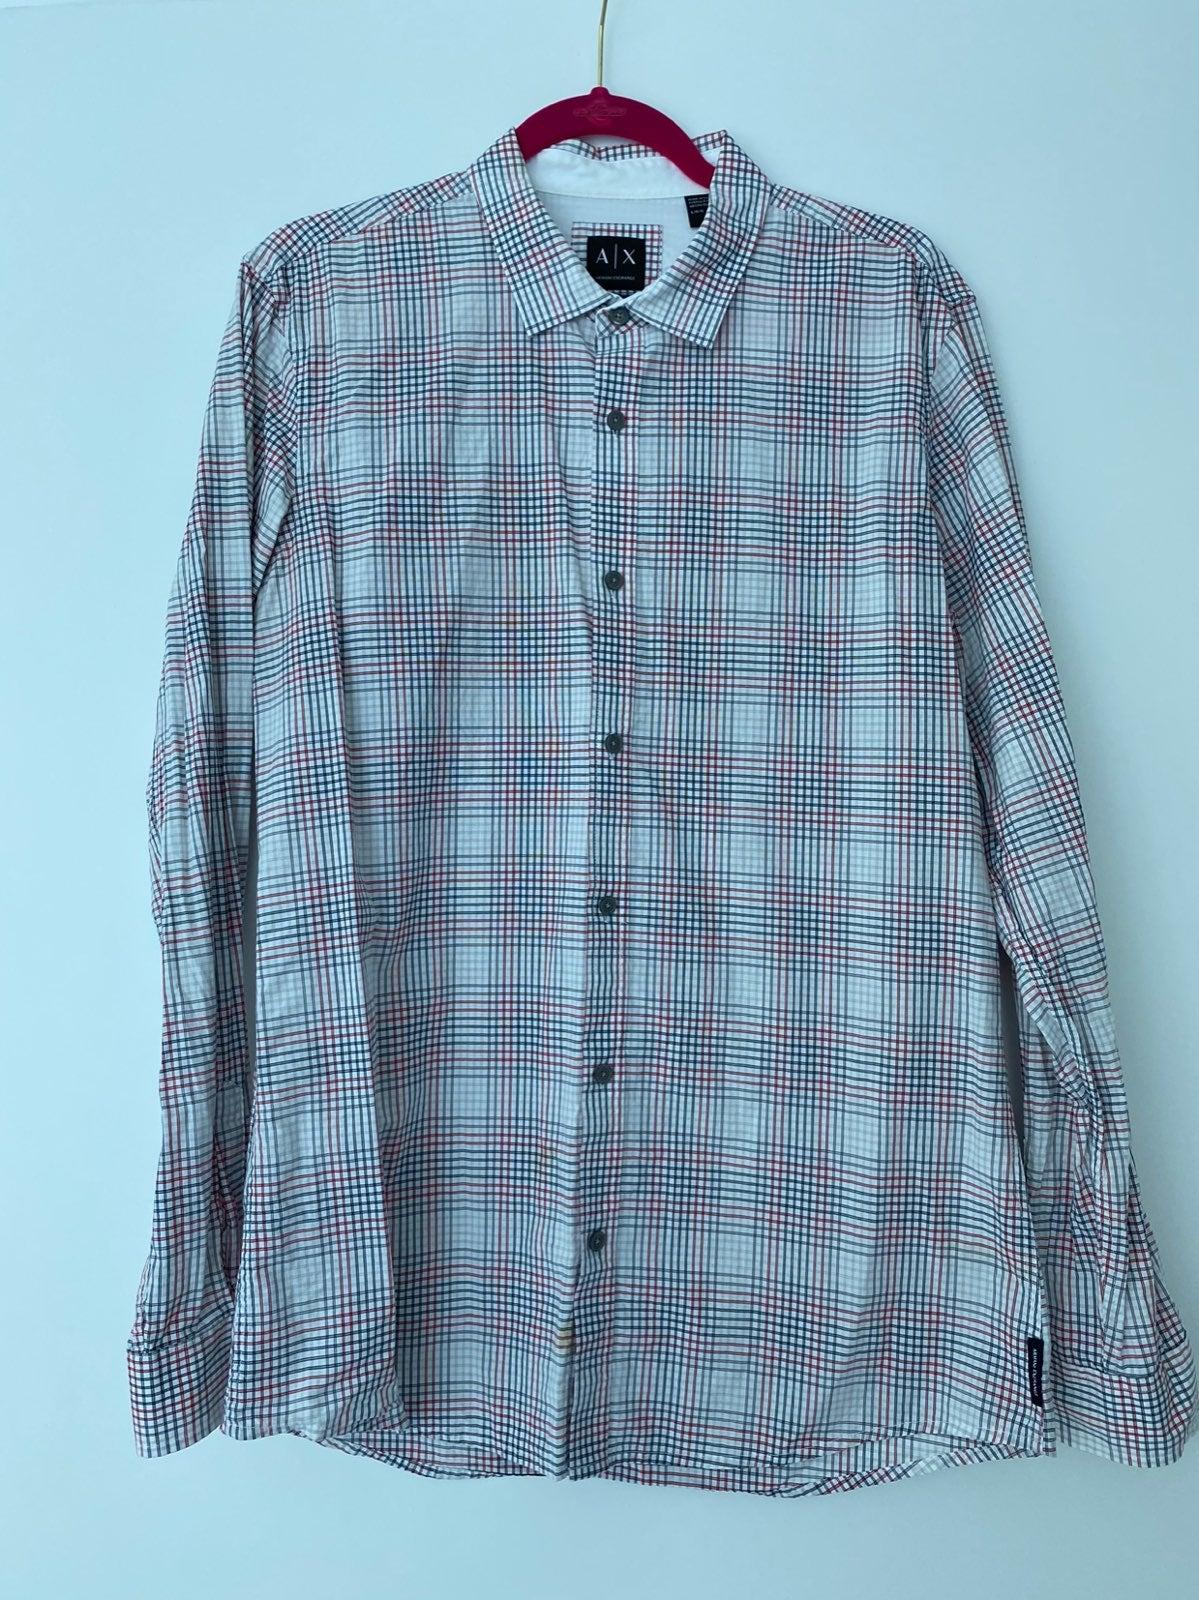 AX Mens Long Sleeve White Striped Shirt